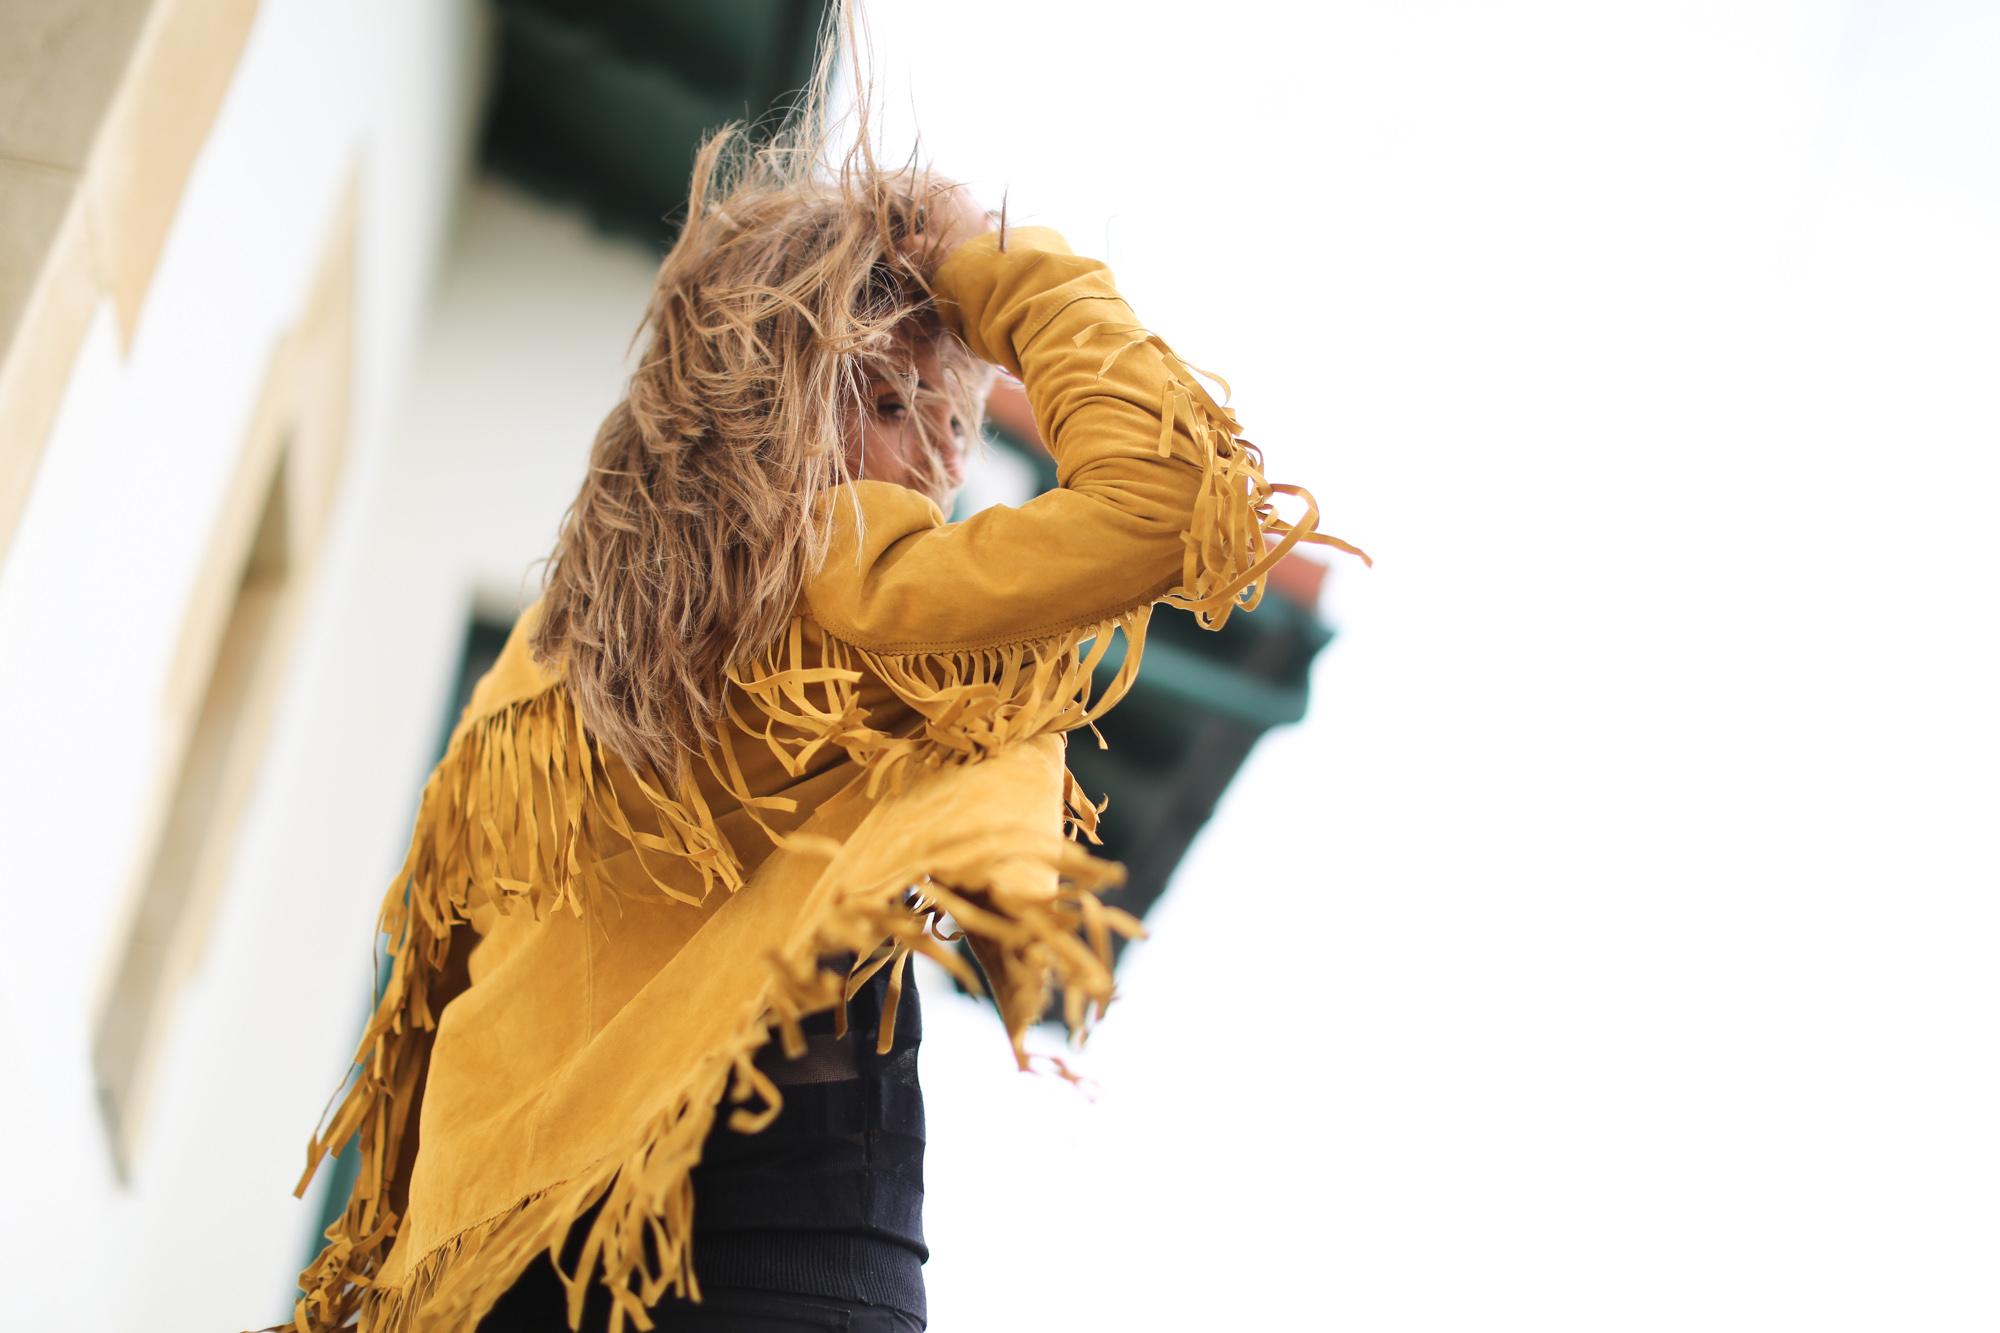 Clochet_Streetstyle_zara_yellow_suede_fringed_jacket-10